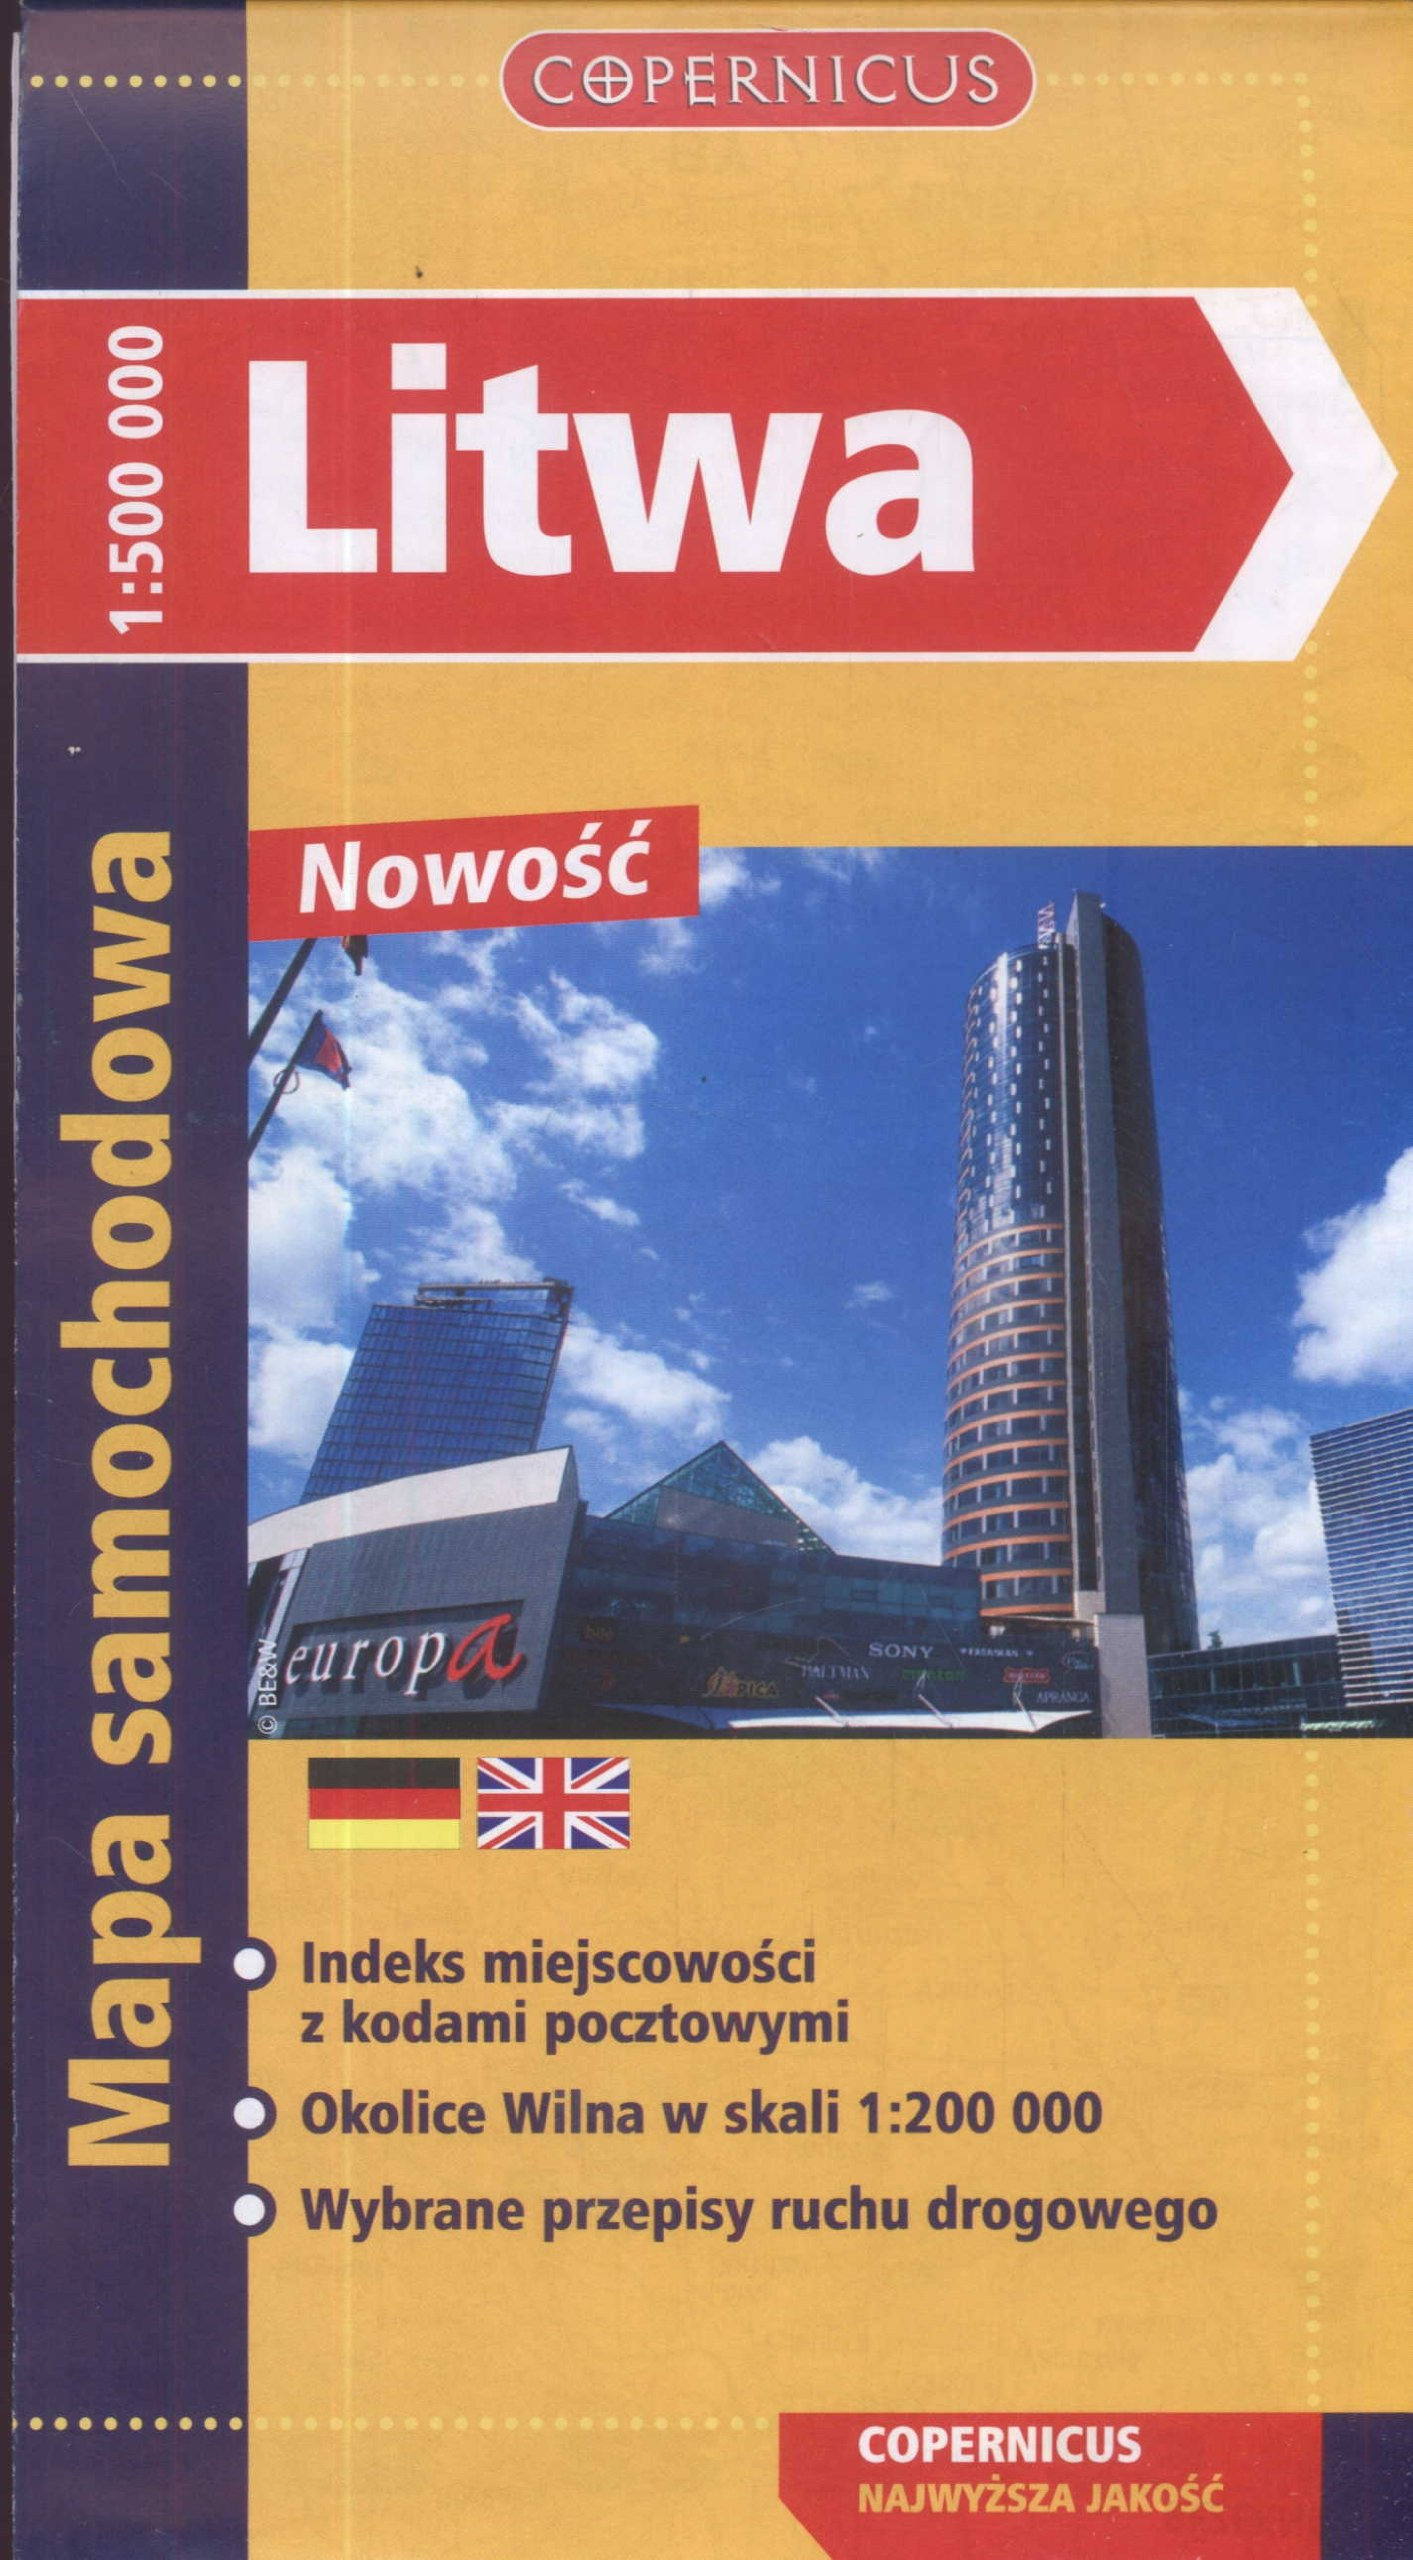 Litwa Mapa Samochodowa Amazon Co Uk 9788375392487 Books